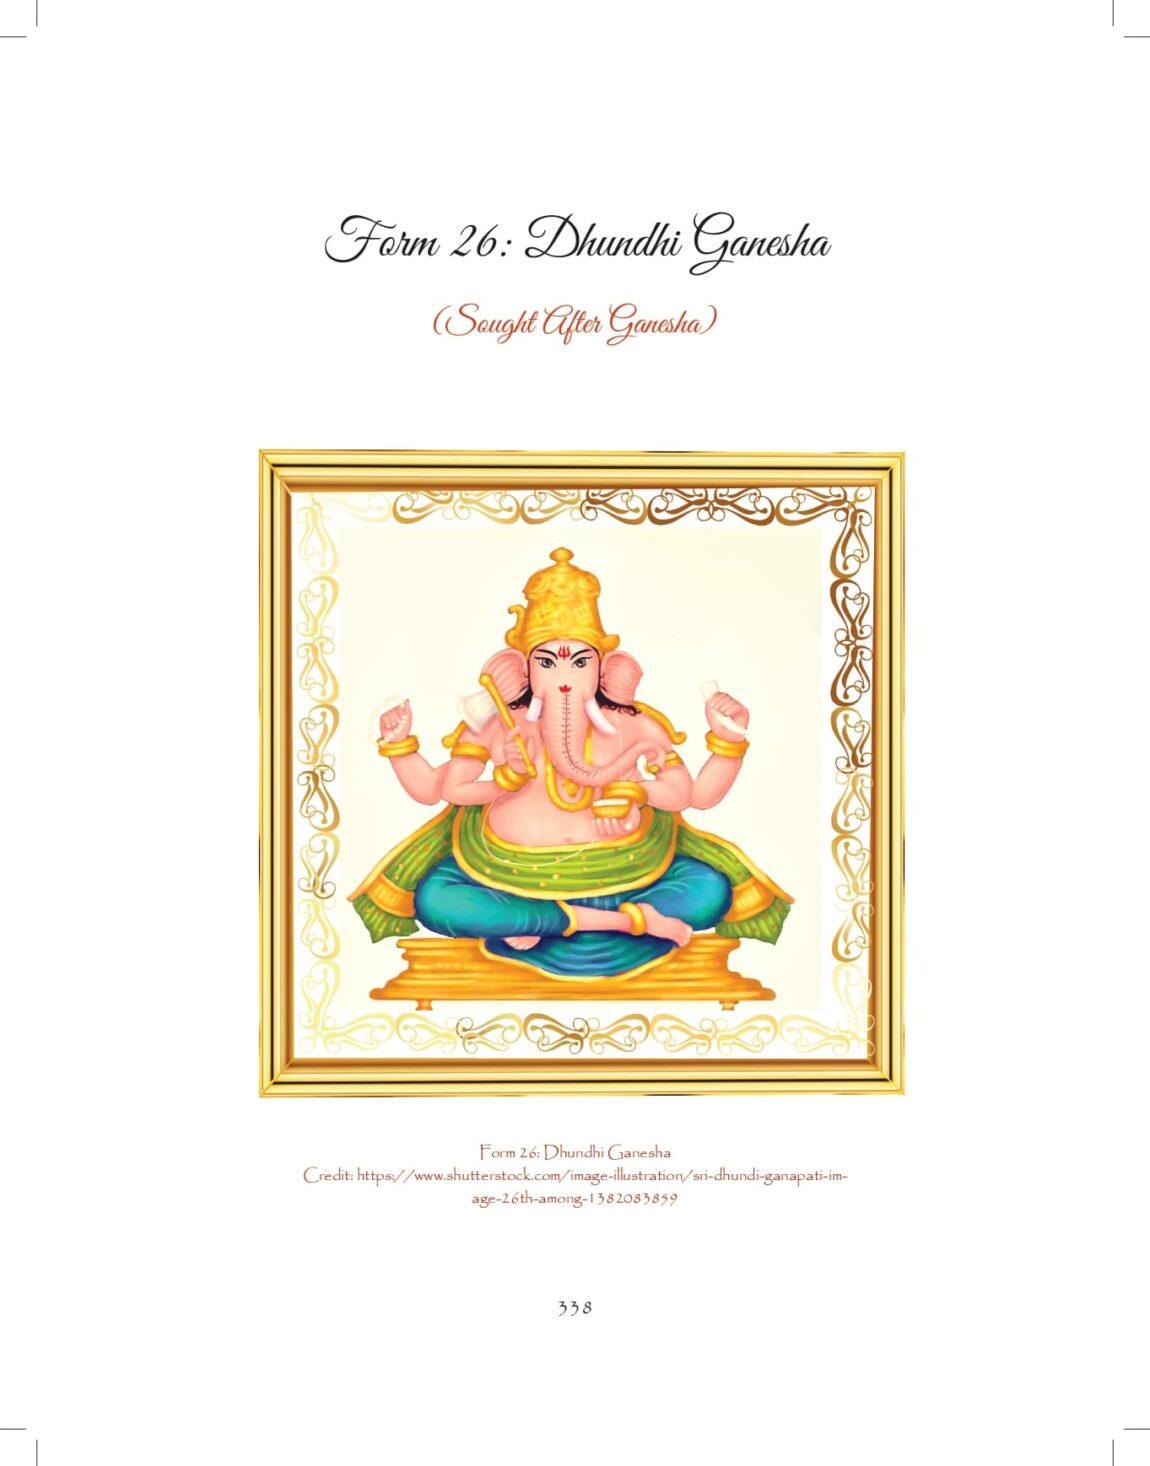 Ganesh-print_pages-to-jpg-0338.jpg